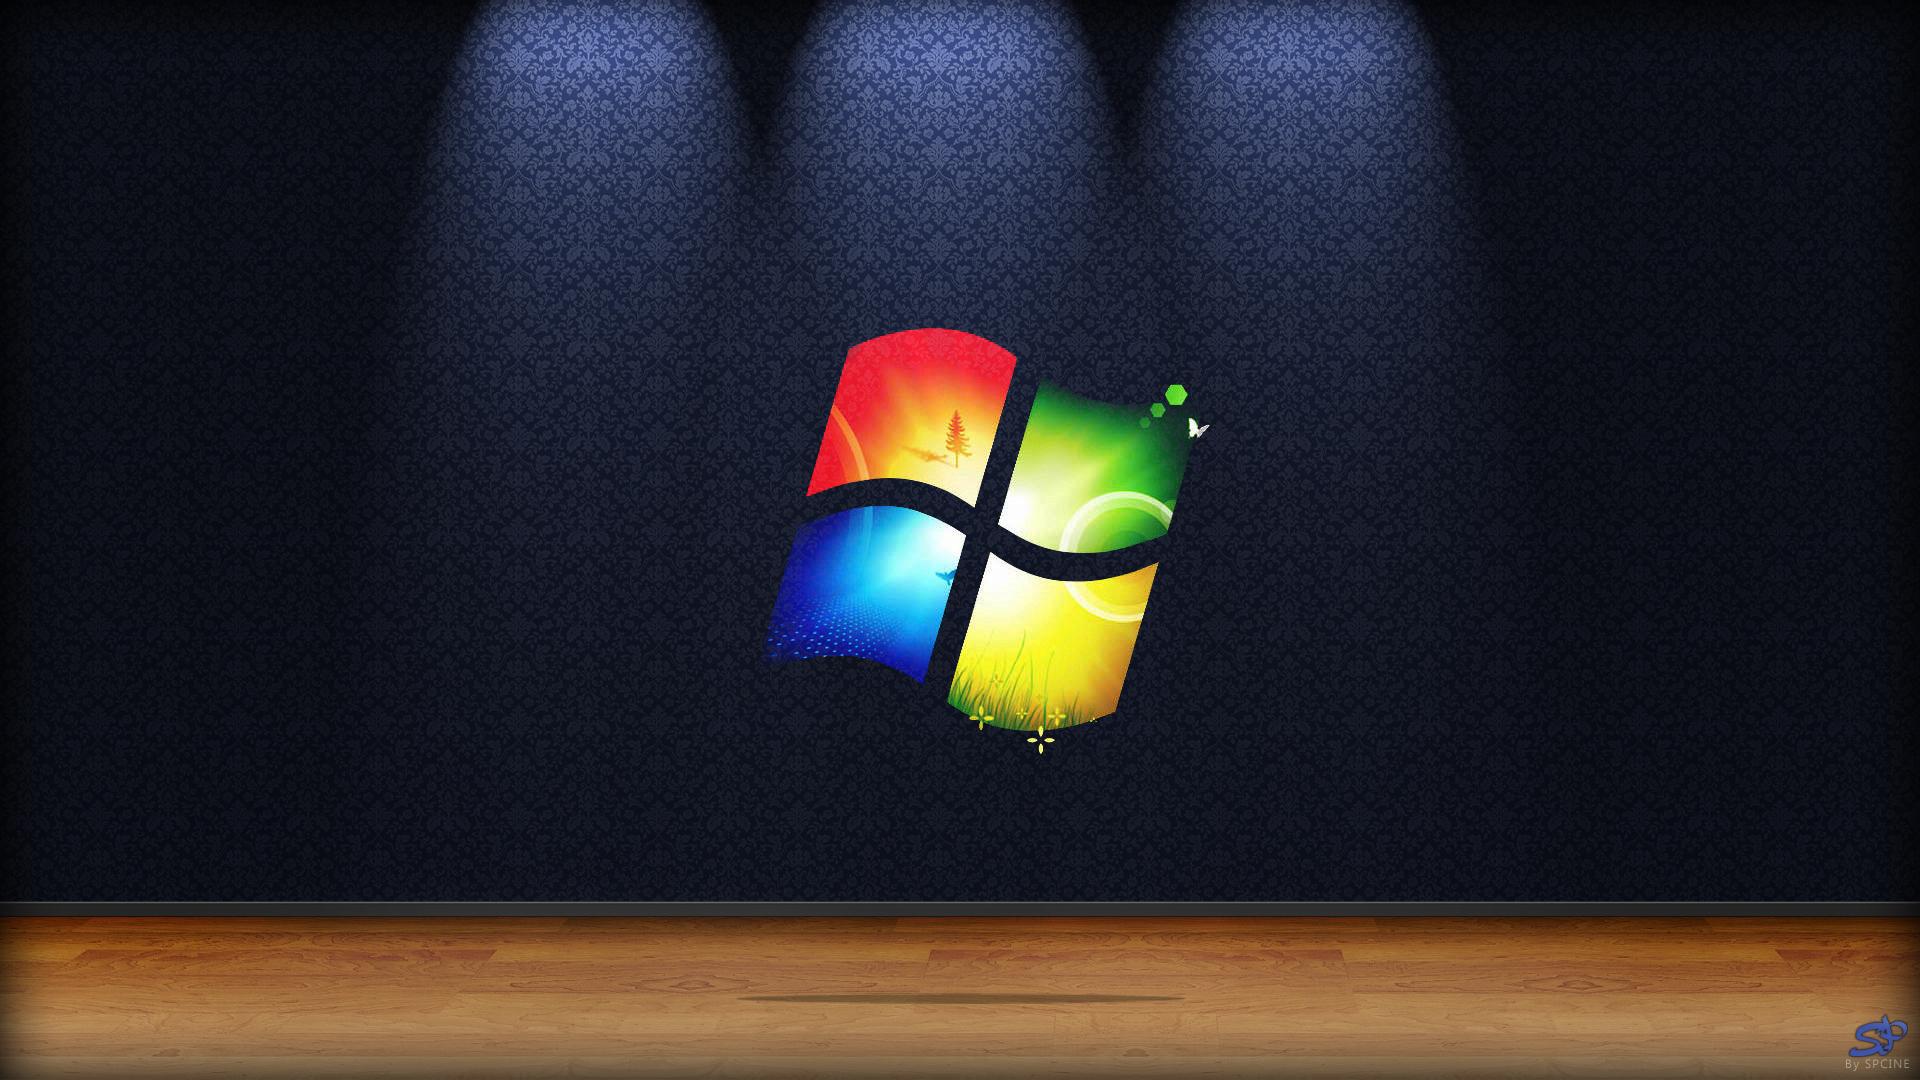 windows 7 wallpaperspcine on deviantart